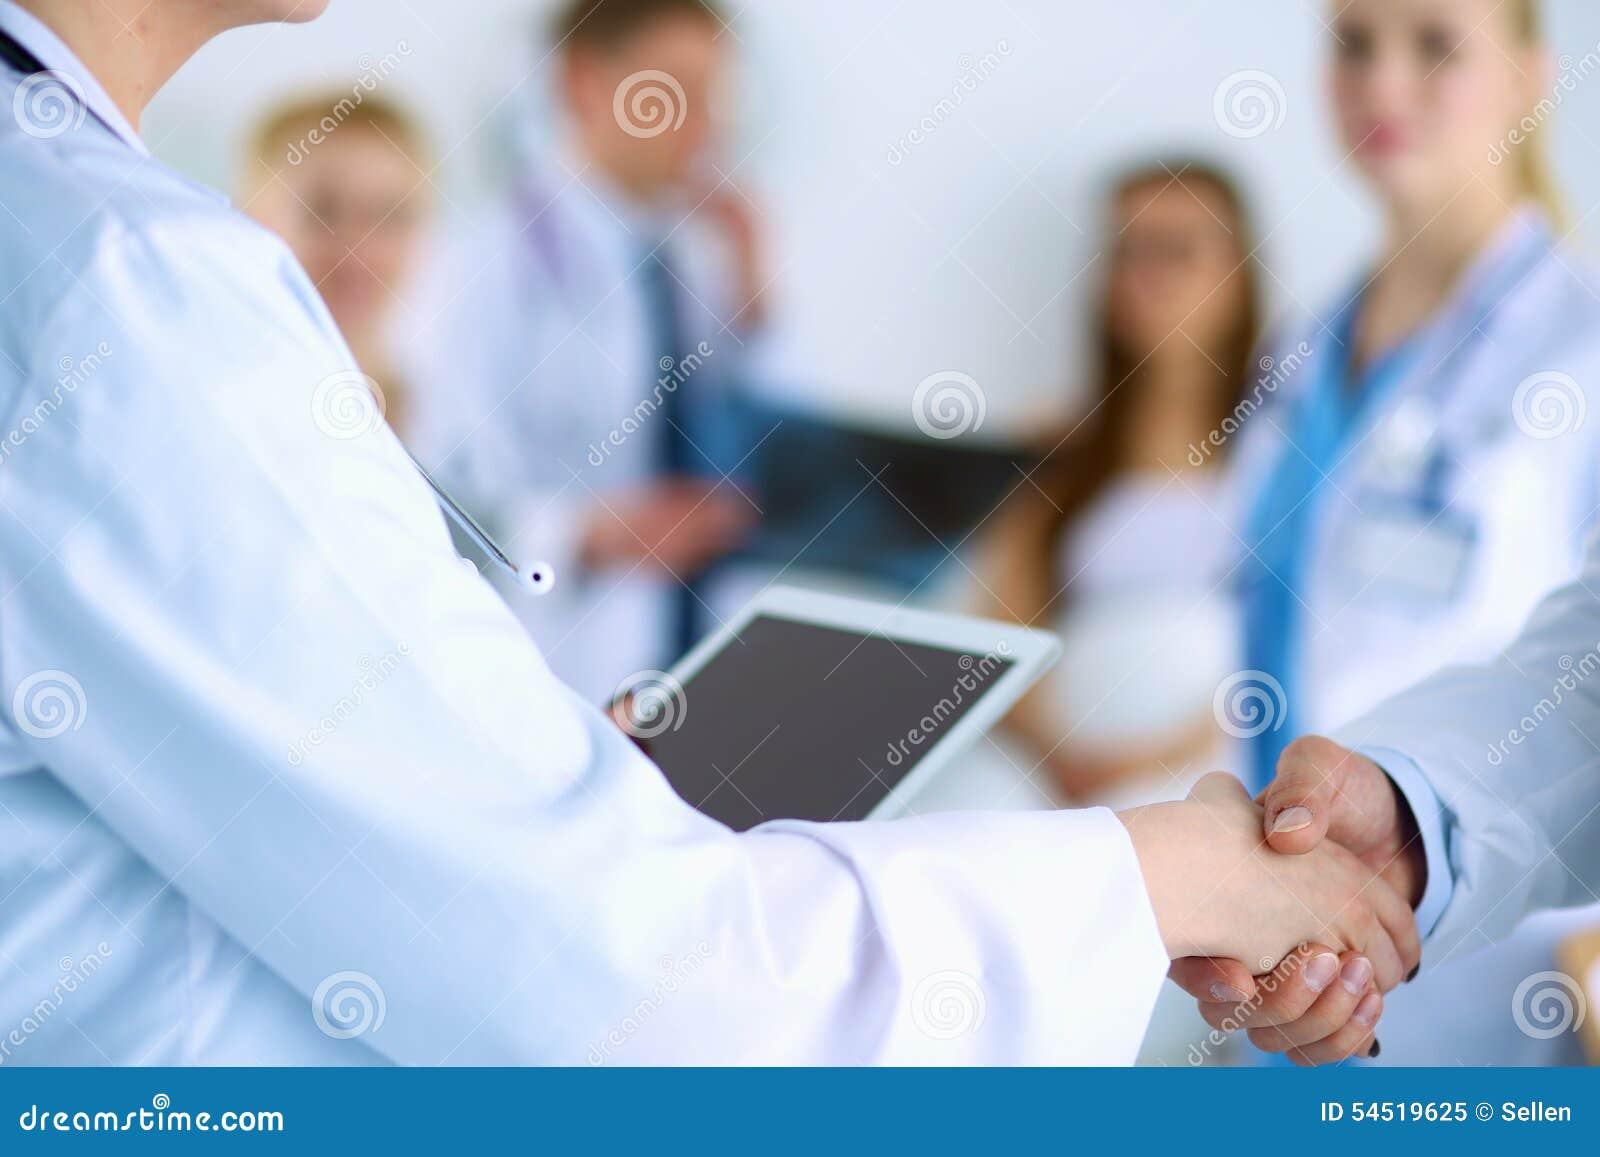 Jeune poignée de main médicale de personnes au bureau